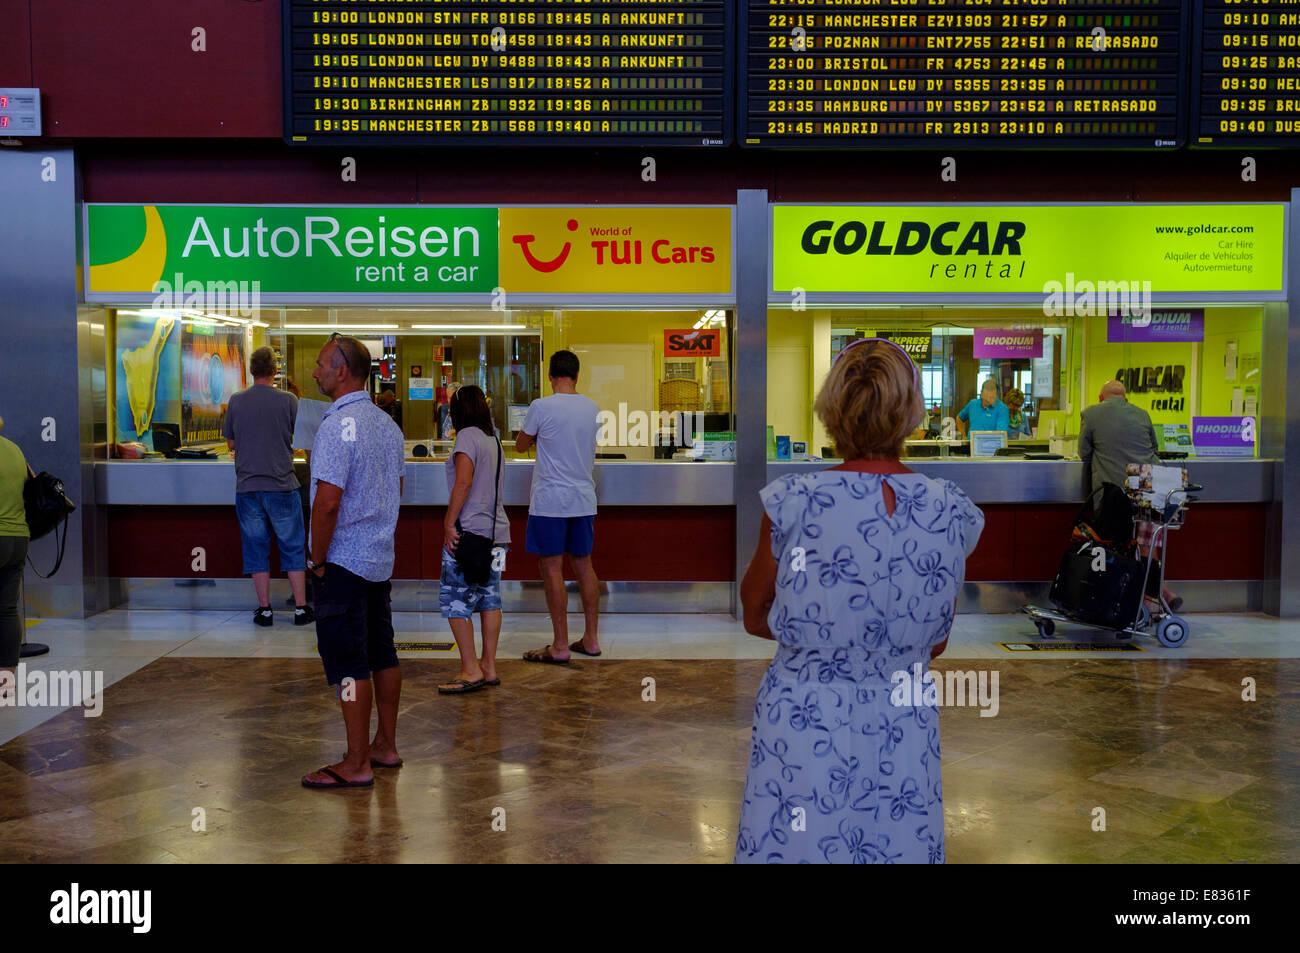 Car Hire Lanzarote Airport Autoreisen